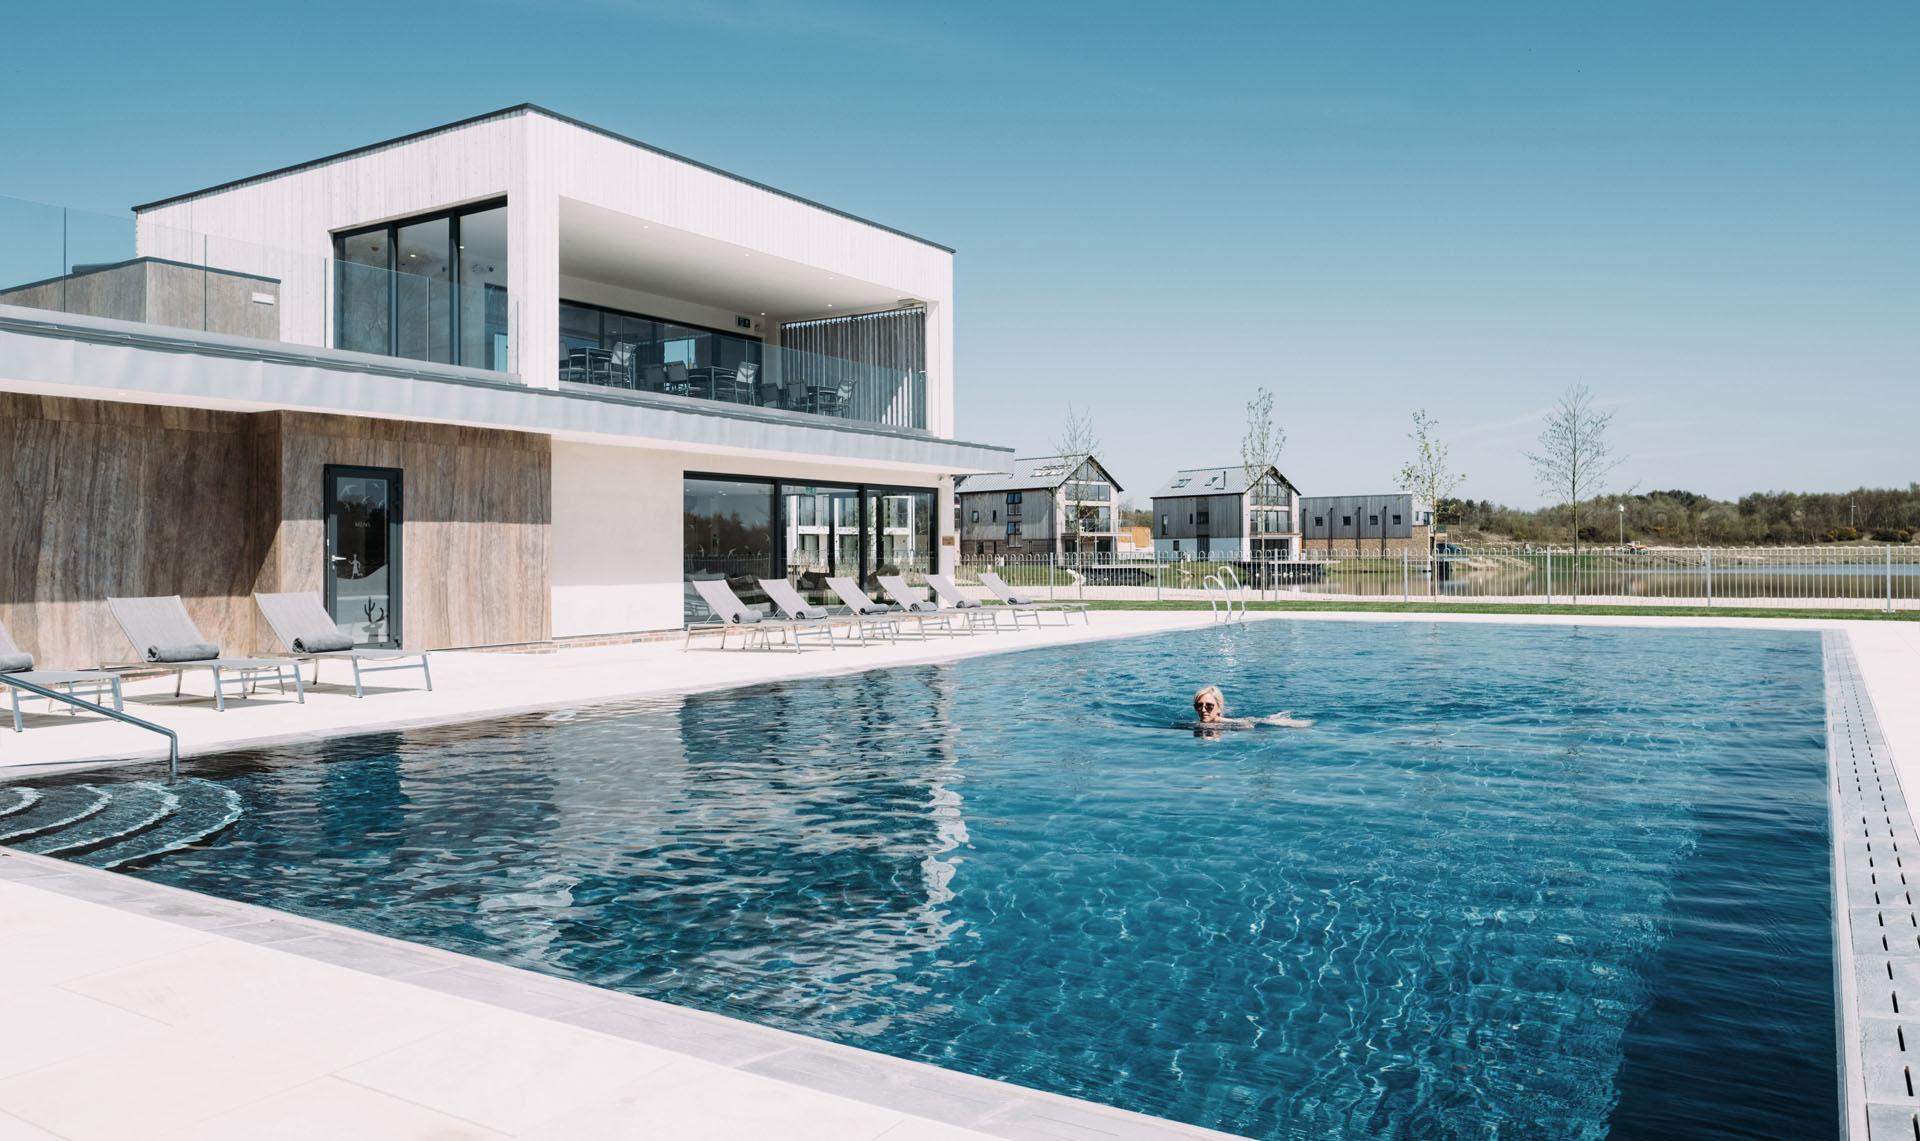 Silverlake-Dorset-Spa-Designers-Exterior-Pool-view